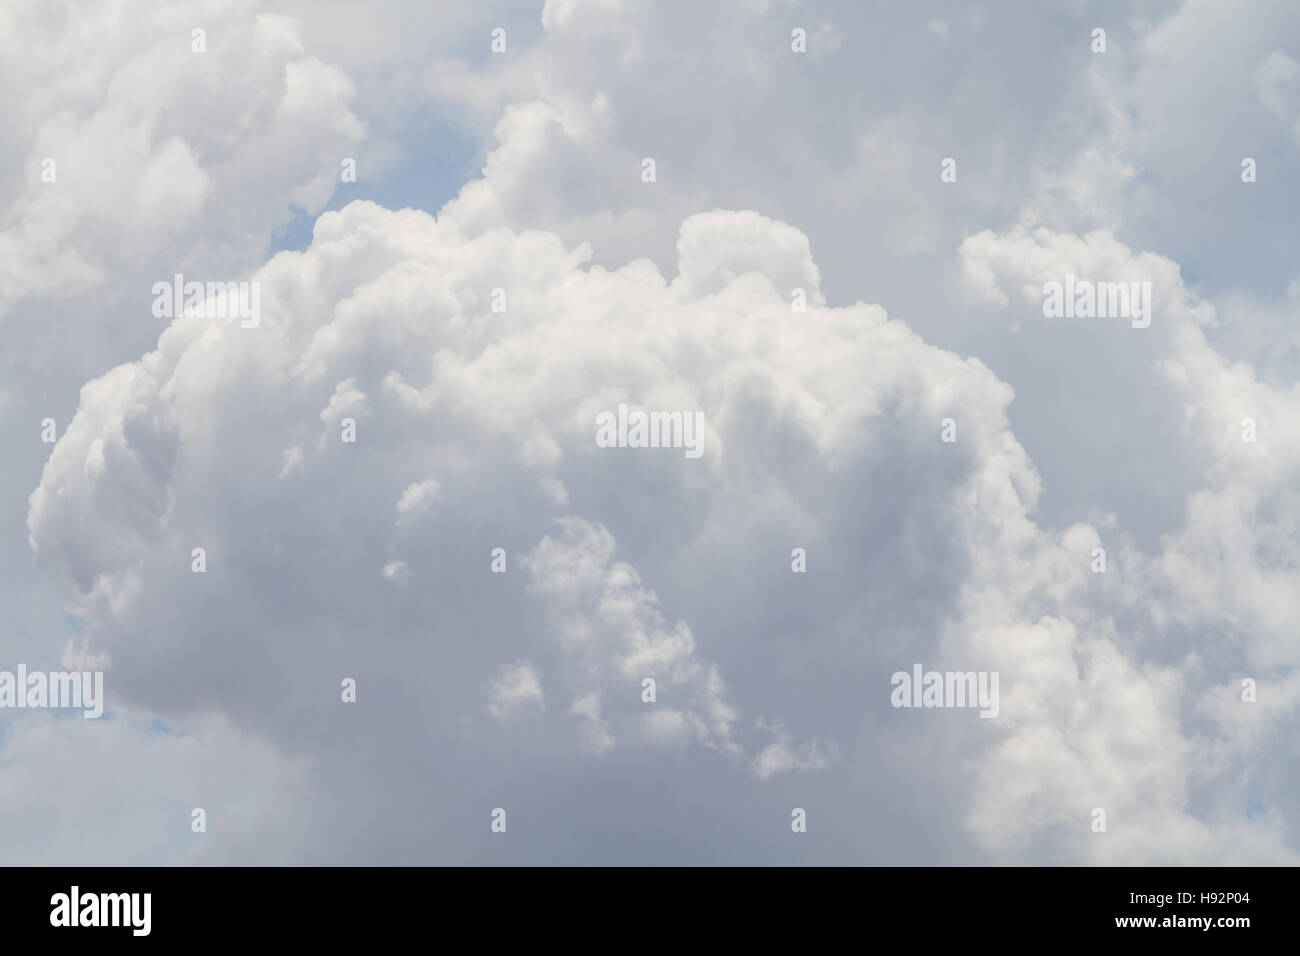 Clouds Form Phenomena - Stock Image